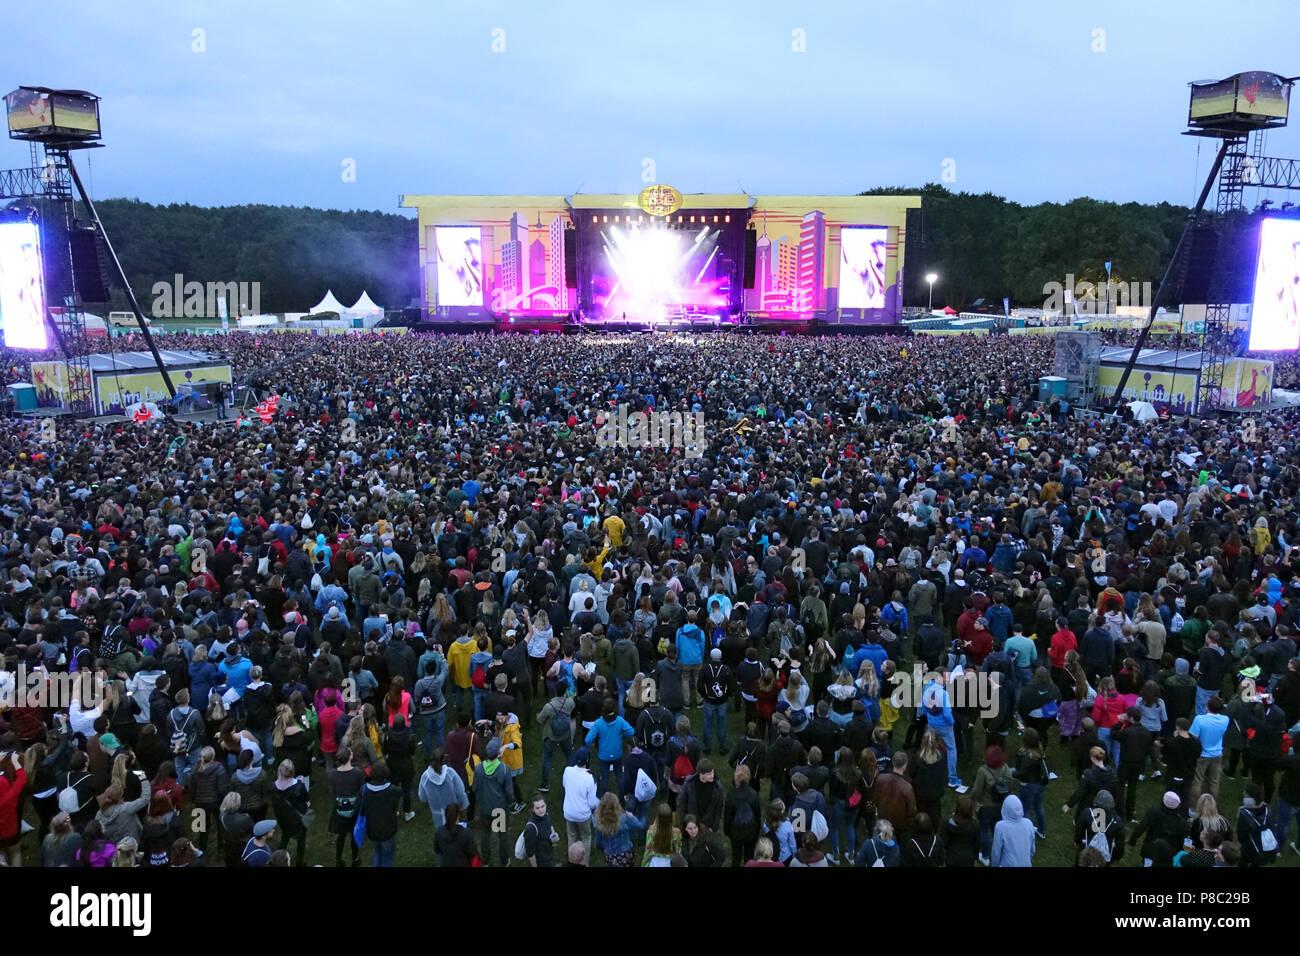 Hoppegarten, Germany, Crowd at Lollapalooza Berlin 2017 at the racecourse Hoppegarten Stock Photo